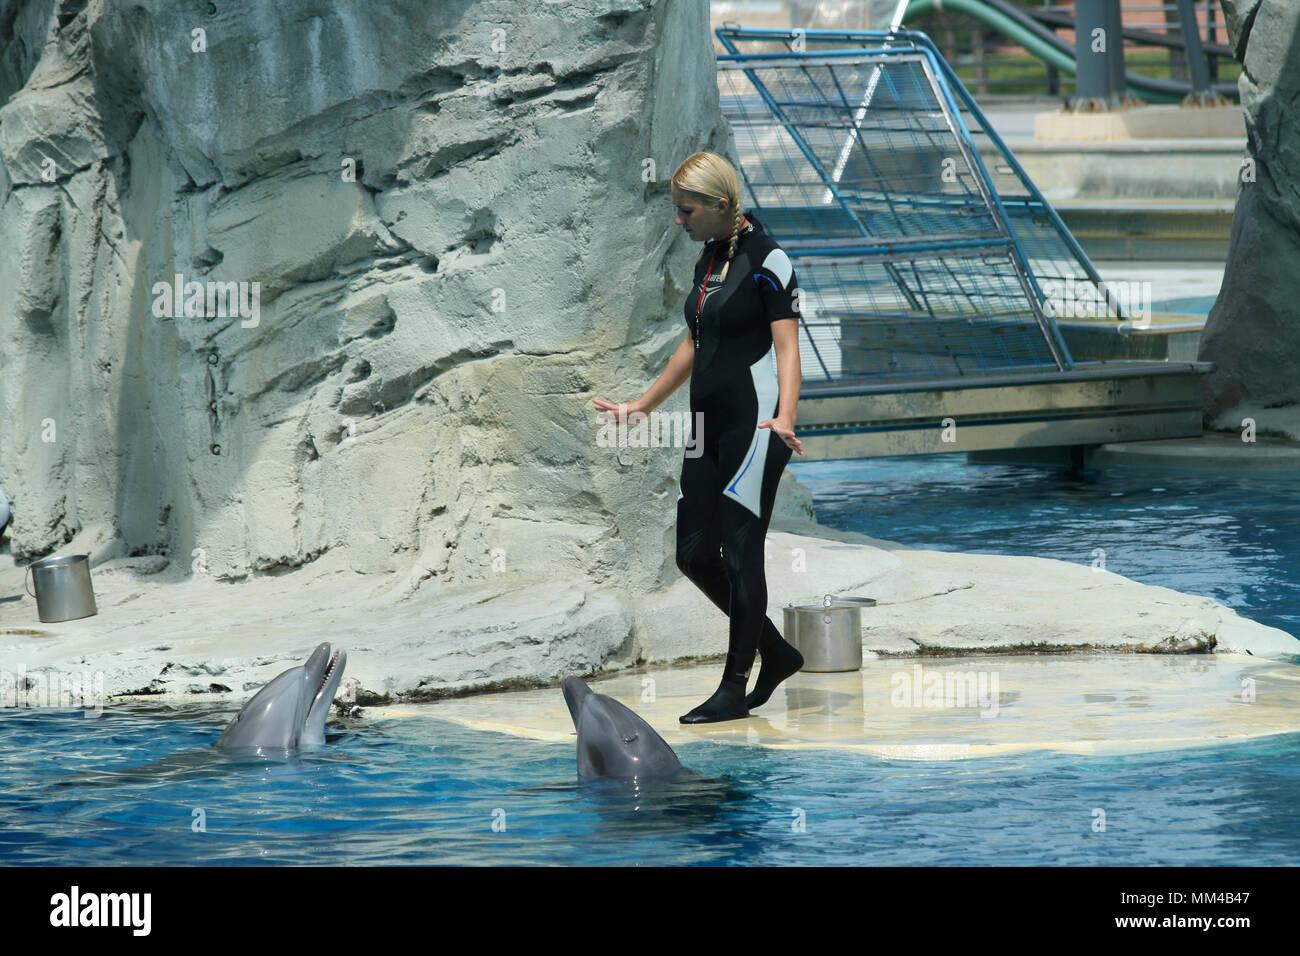 Riccione, Italy, 06 20 2015: dolphin trainers at work in the Oltremare aquarium in Riccione, Italy. Stock Photo